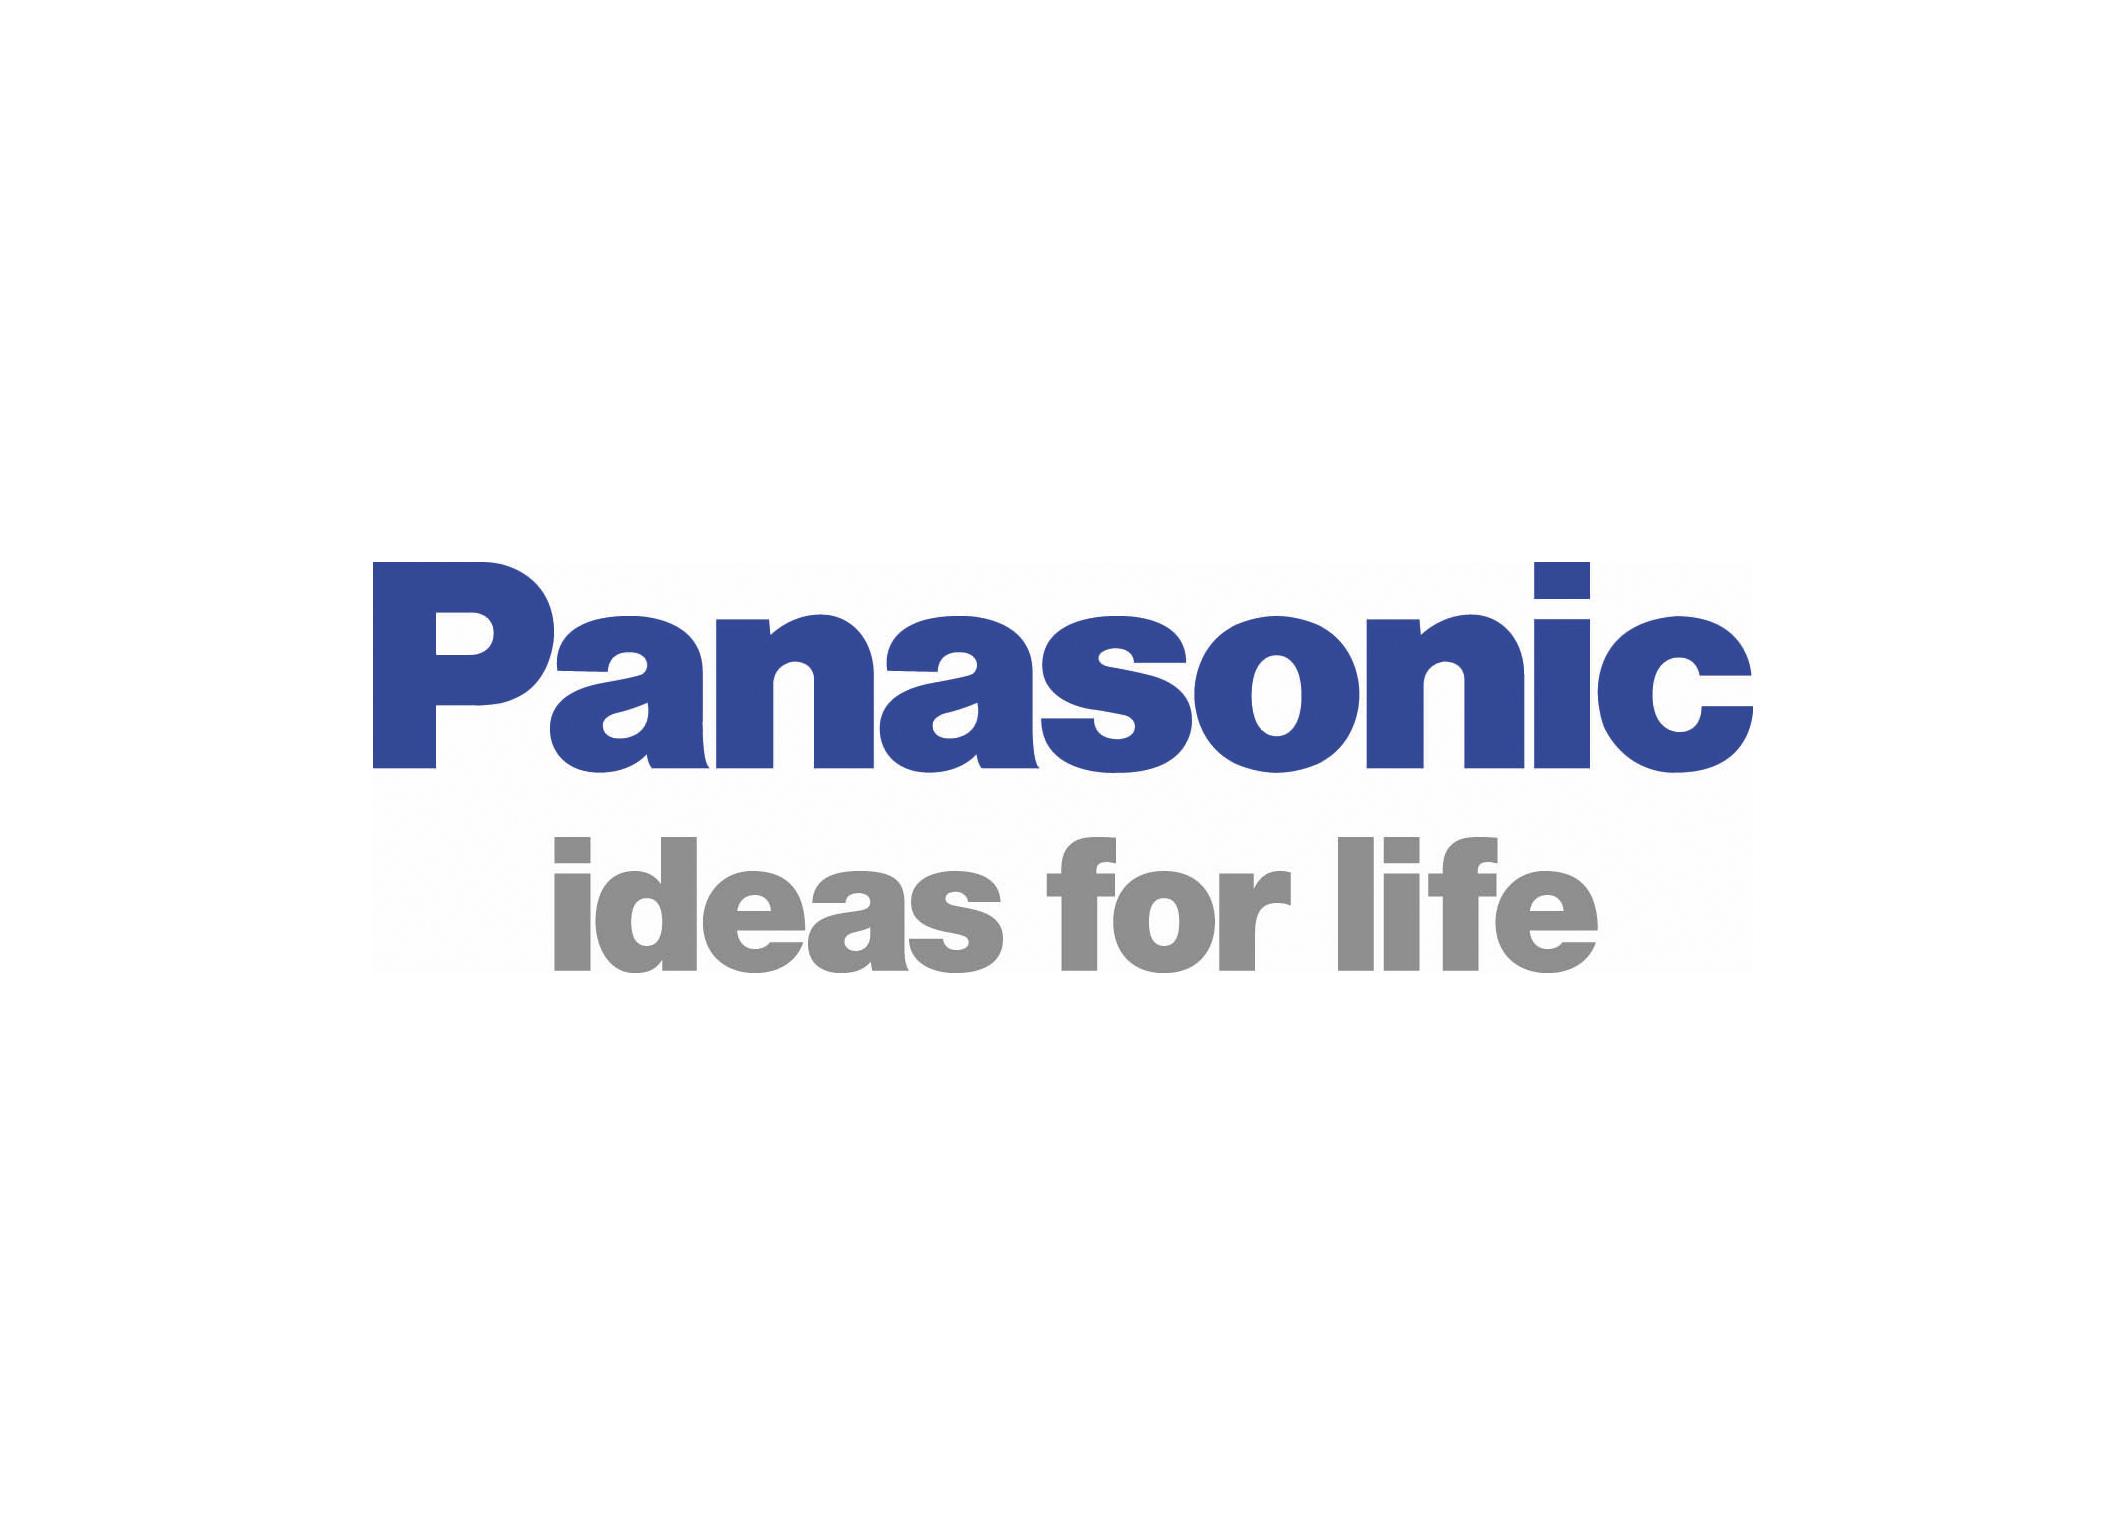 Panasonic_ideas_for_life